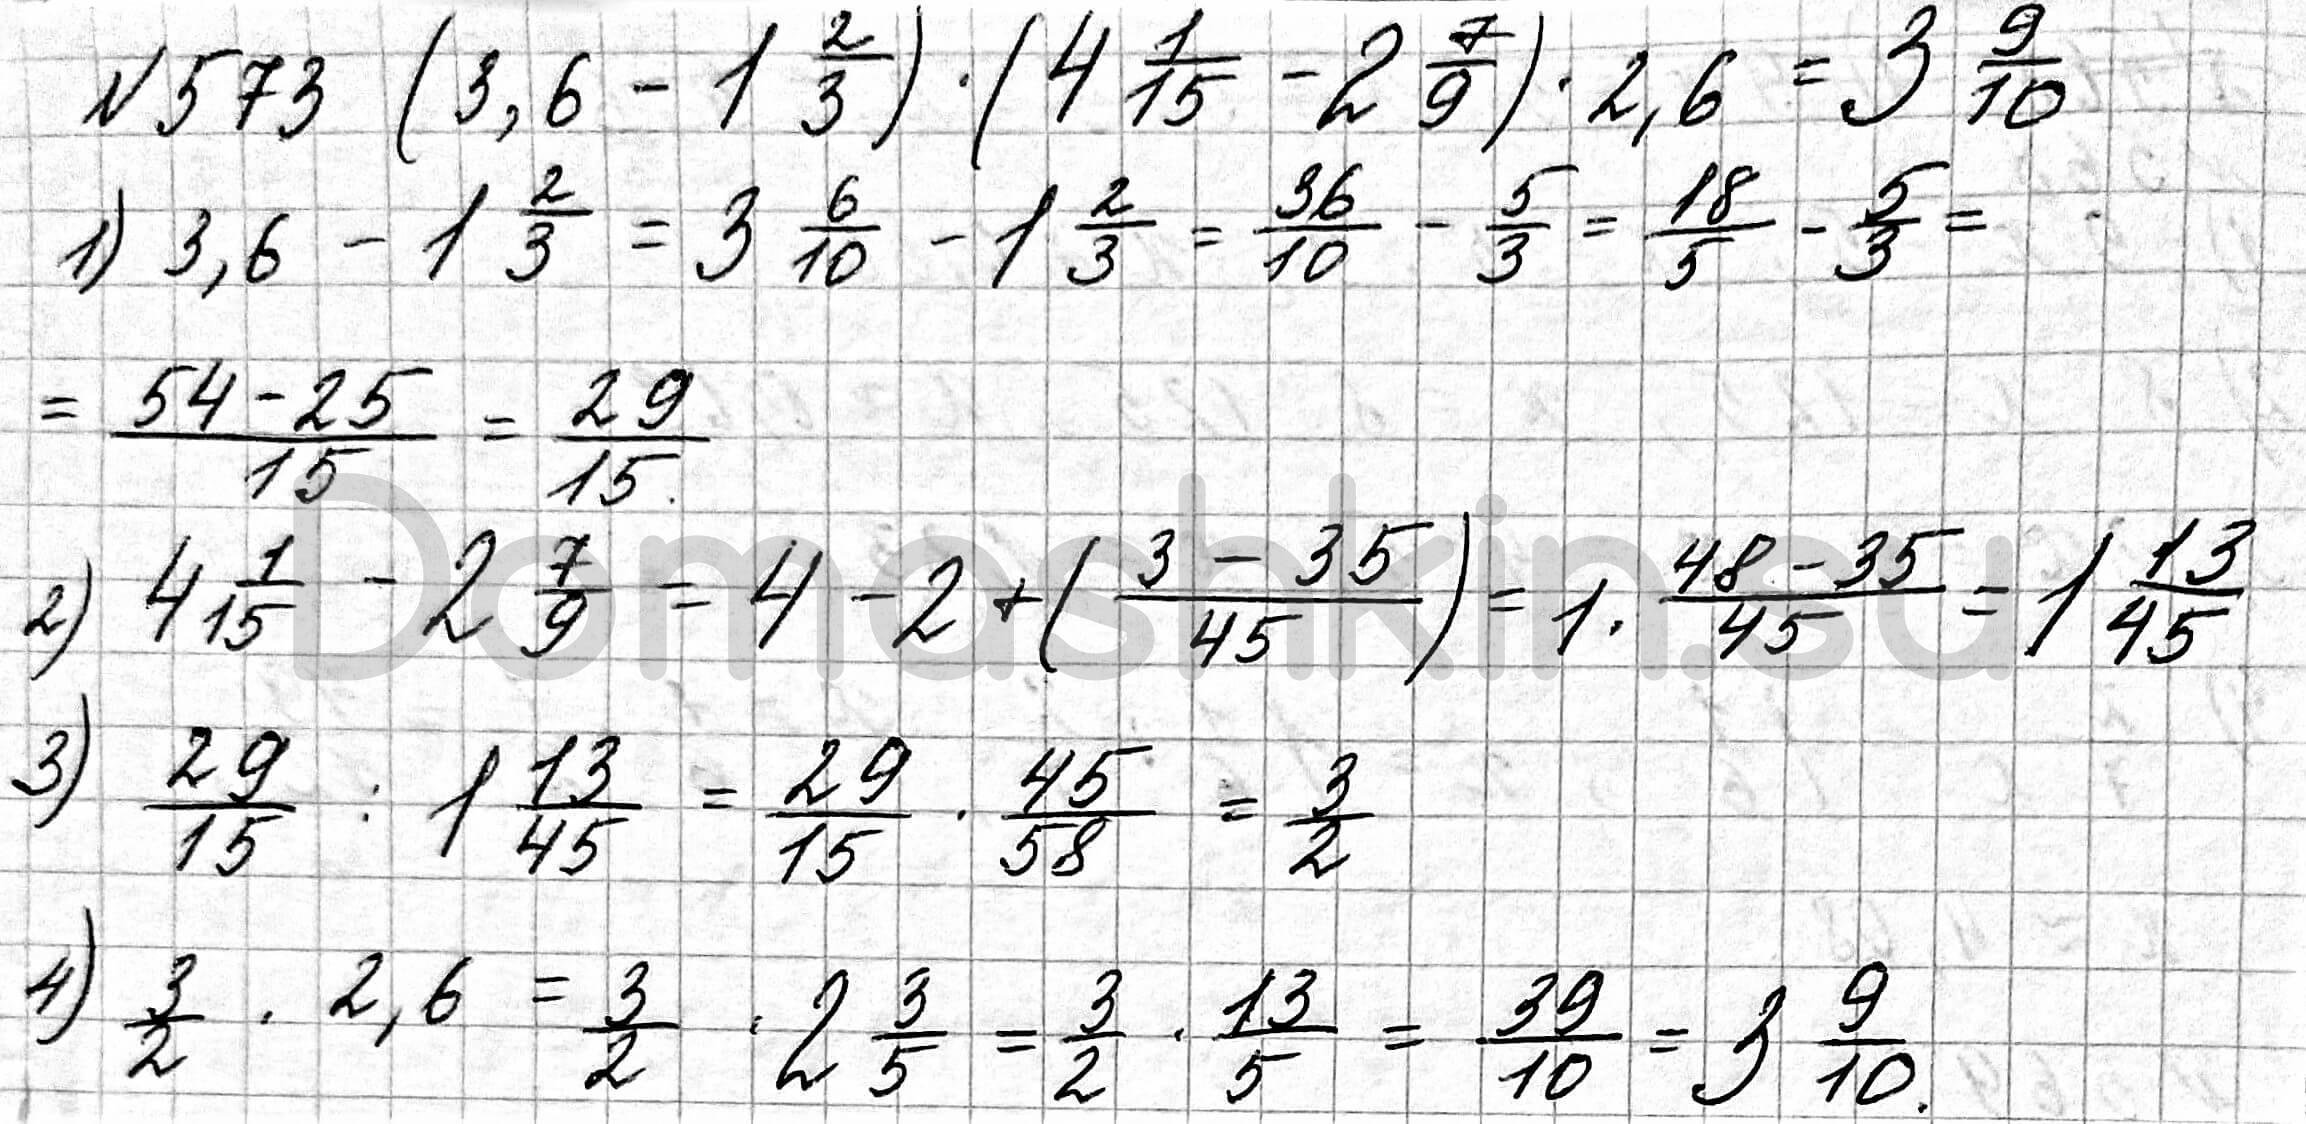 Математика 6 класс учебник Мерзляк номер 573 решение